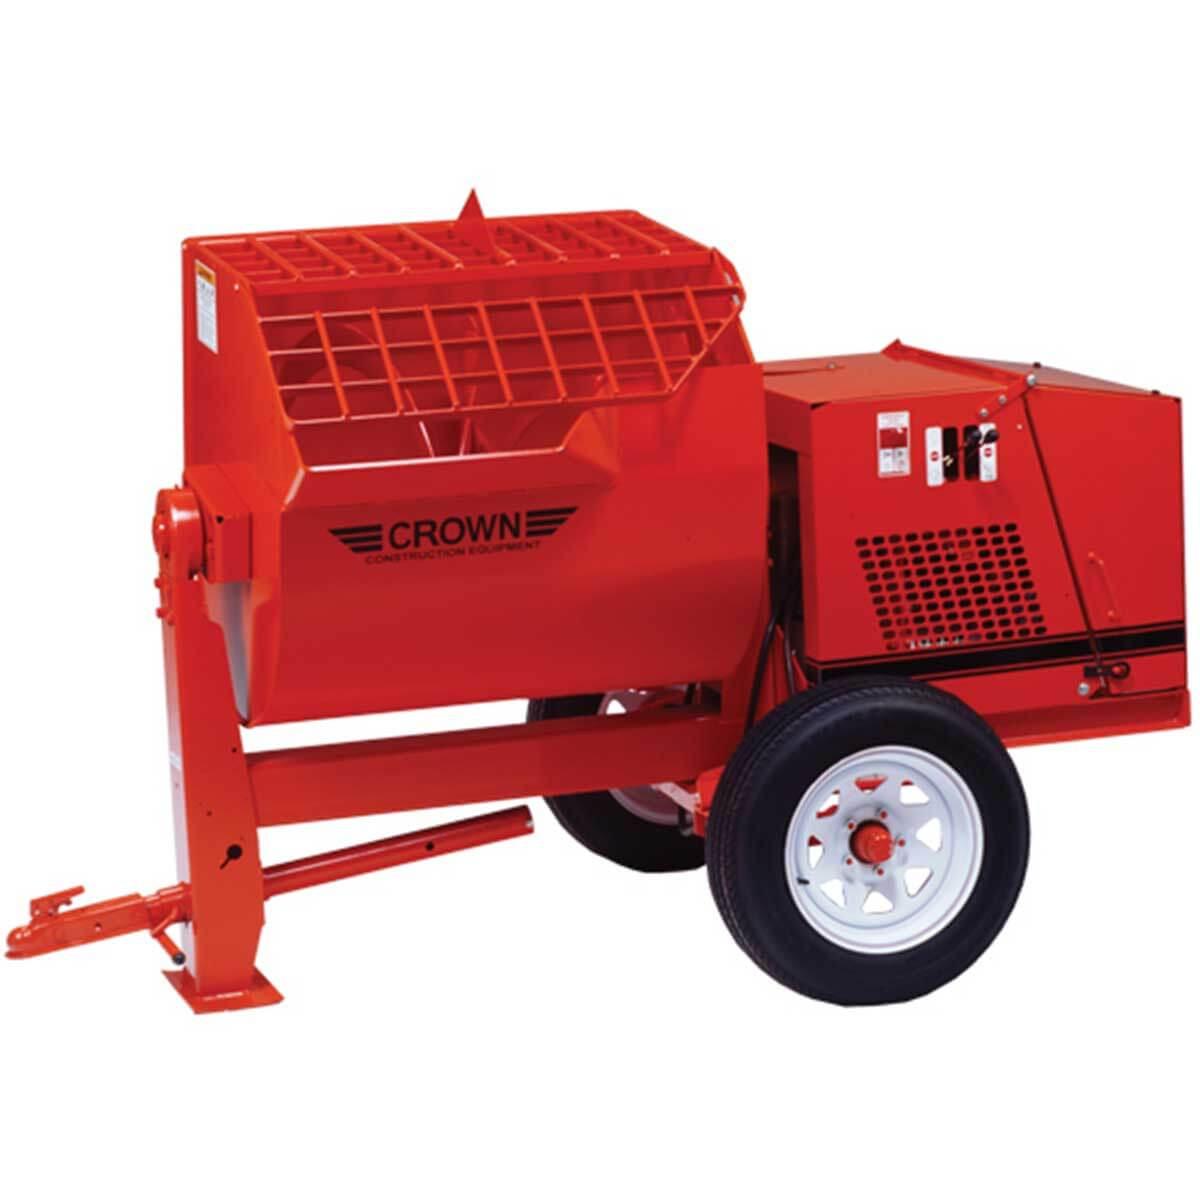 Crown 12SH Hydraulic Mortar Mixer